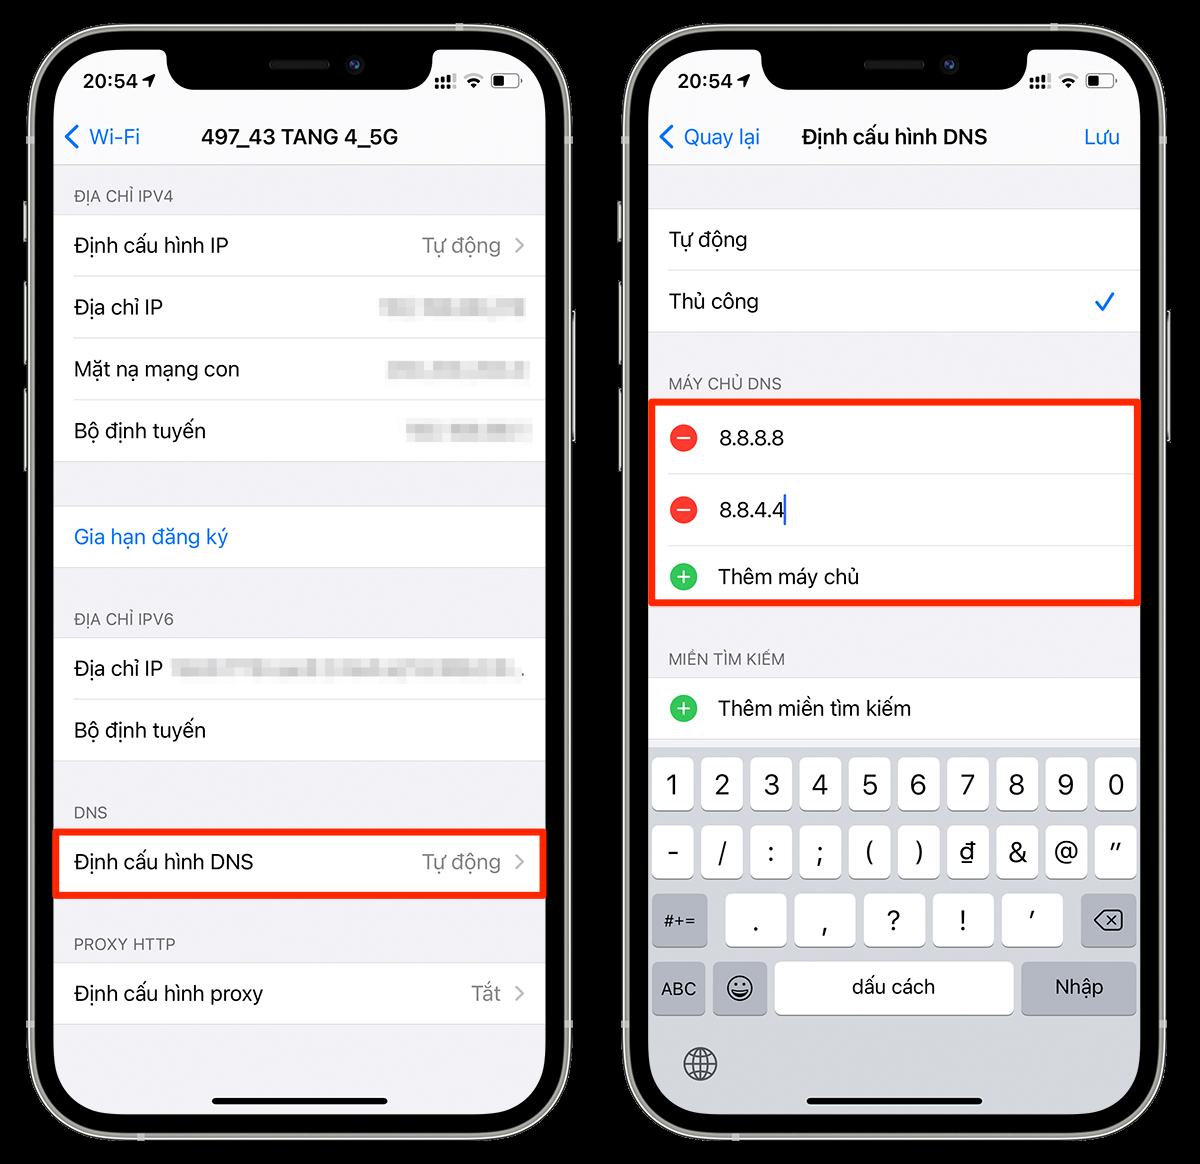 Mẹo sửa lỗi Wi-Fi chậm trên iPhone 8